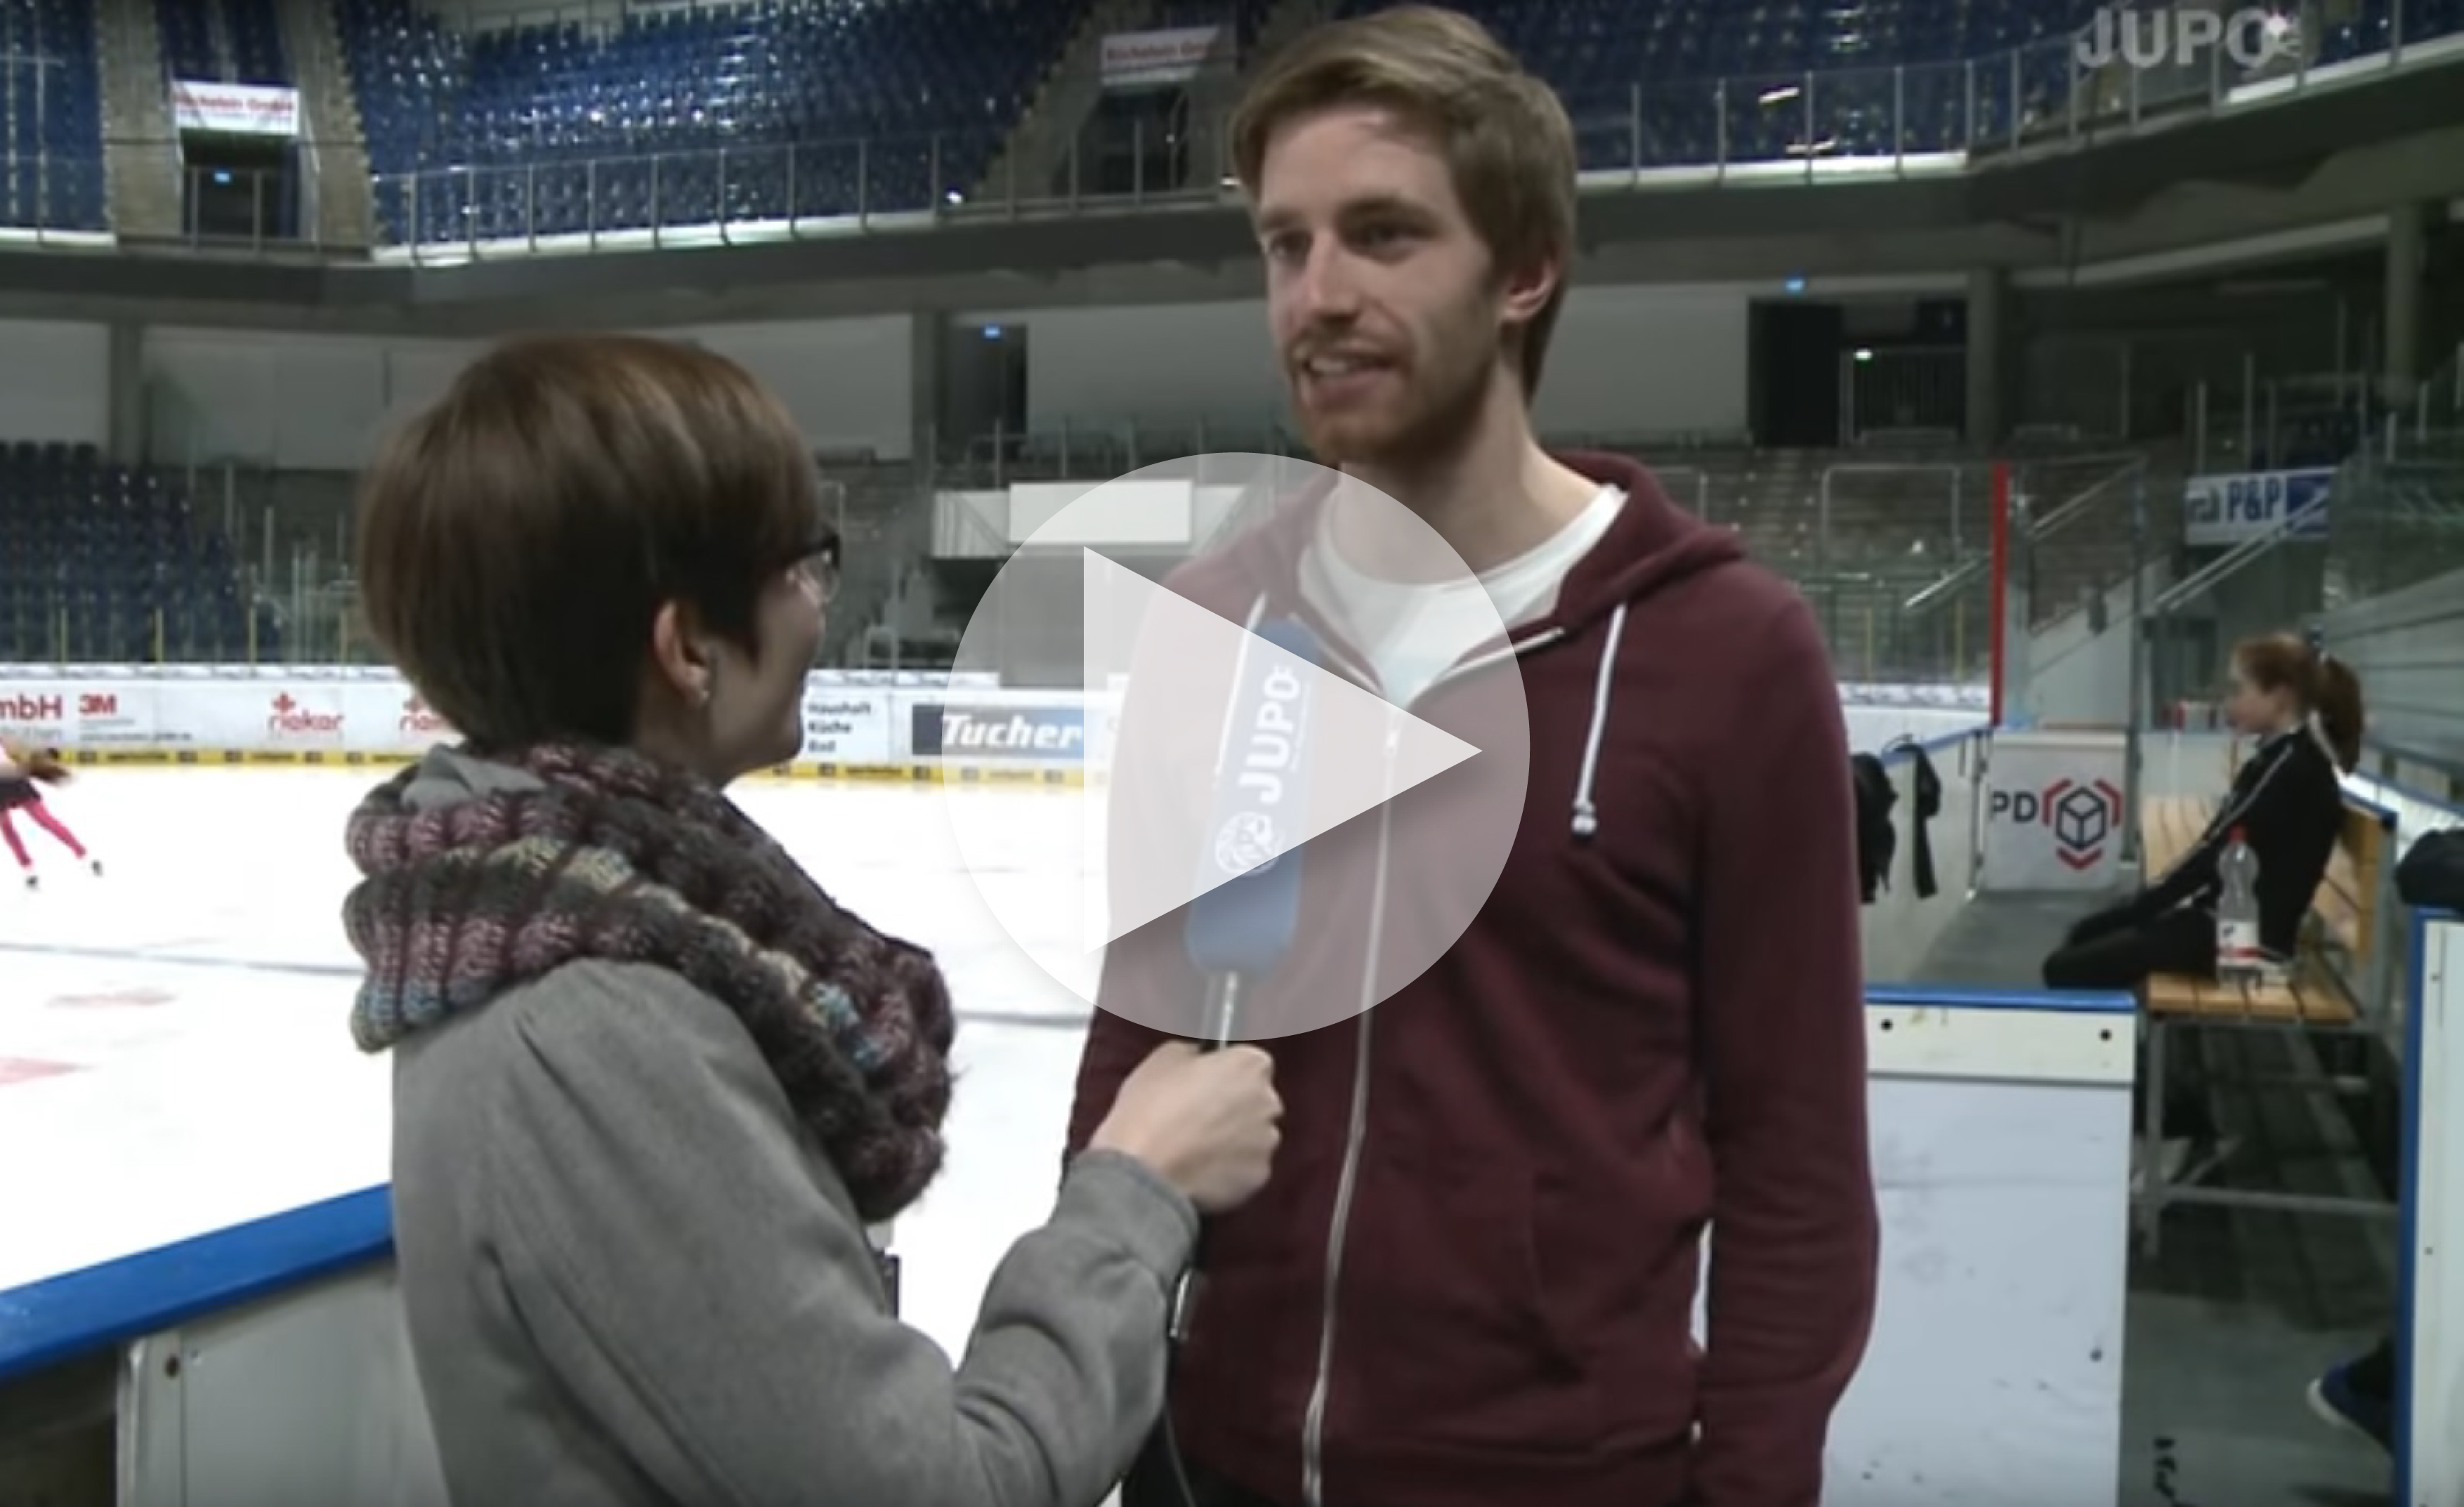 """Eiskunstlaufen und Olympia Sotchi"" JuPo TV - Jugendportal Bayern"